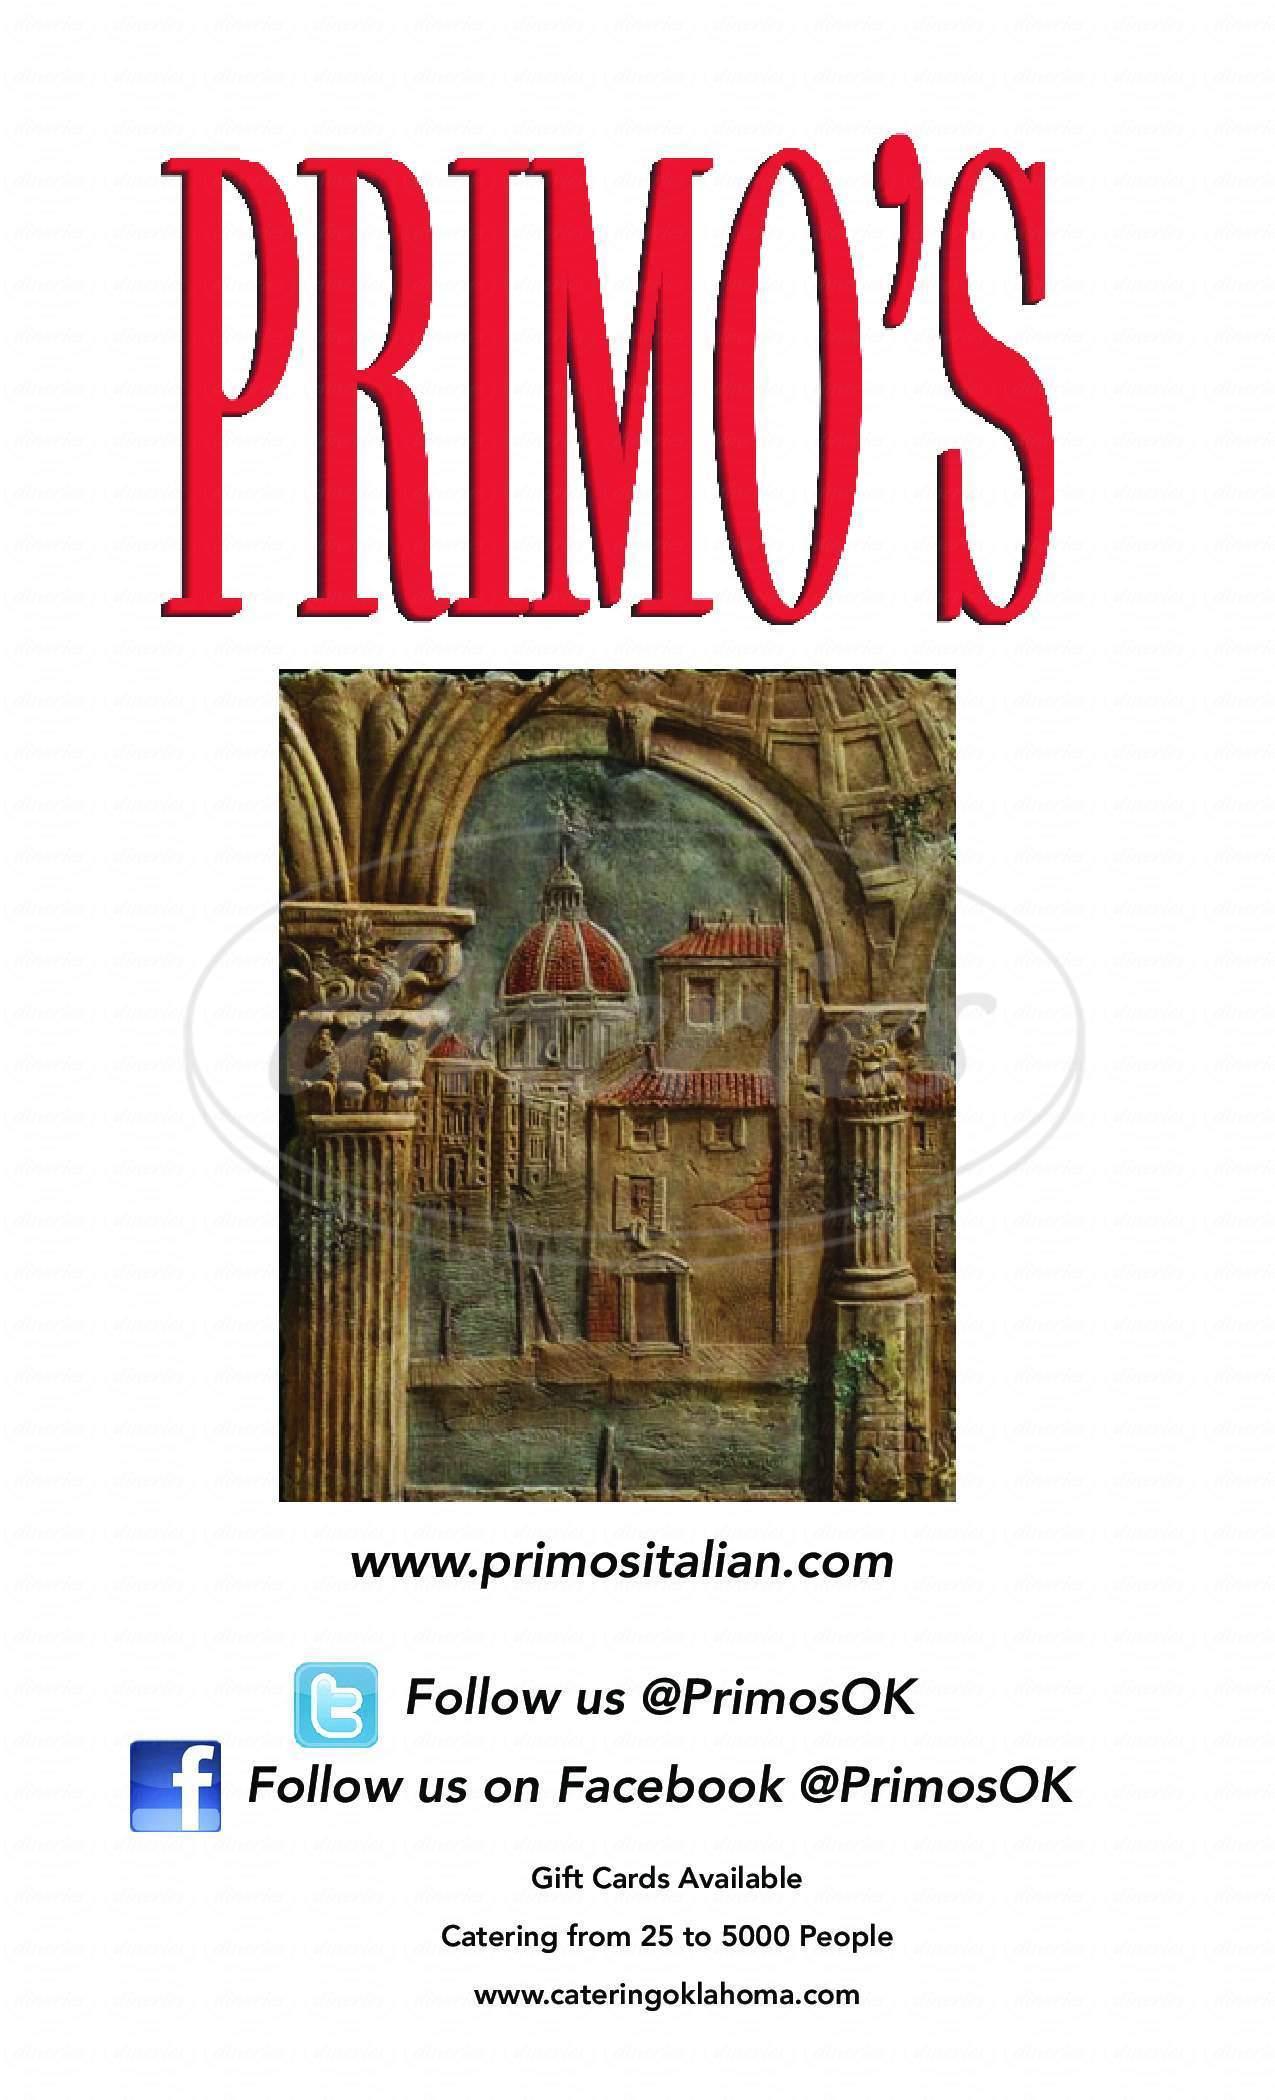 menu for Primo's d'italia